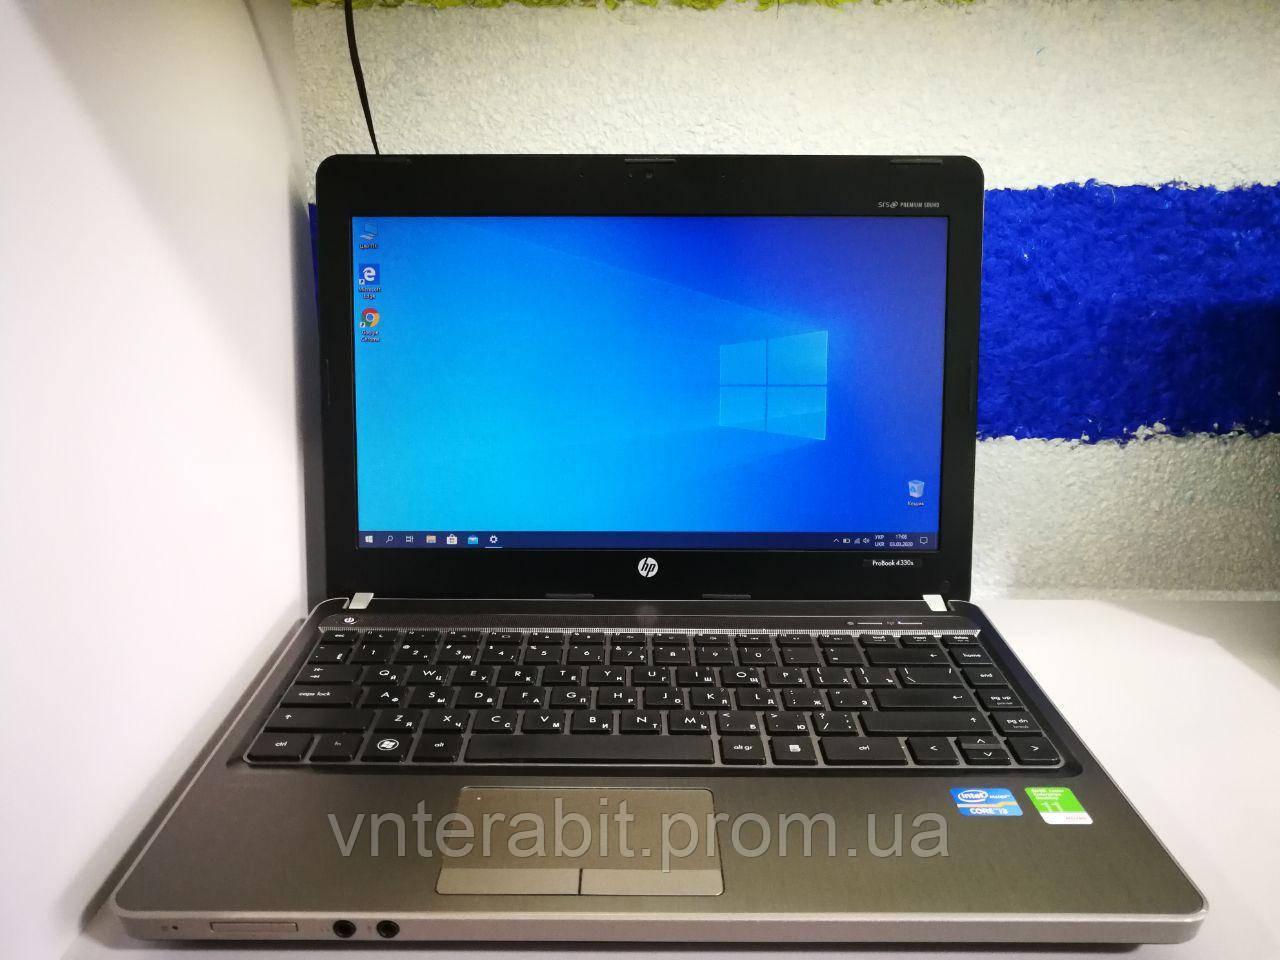 Ноутбук HP ProBook 4330s/Intel i3-2350m (2.3GHz)/4GB/HD 3000